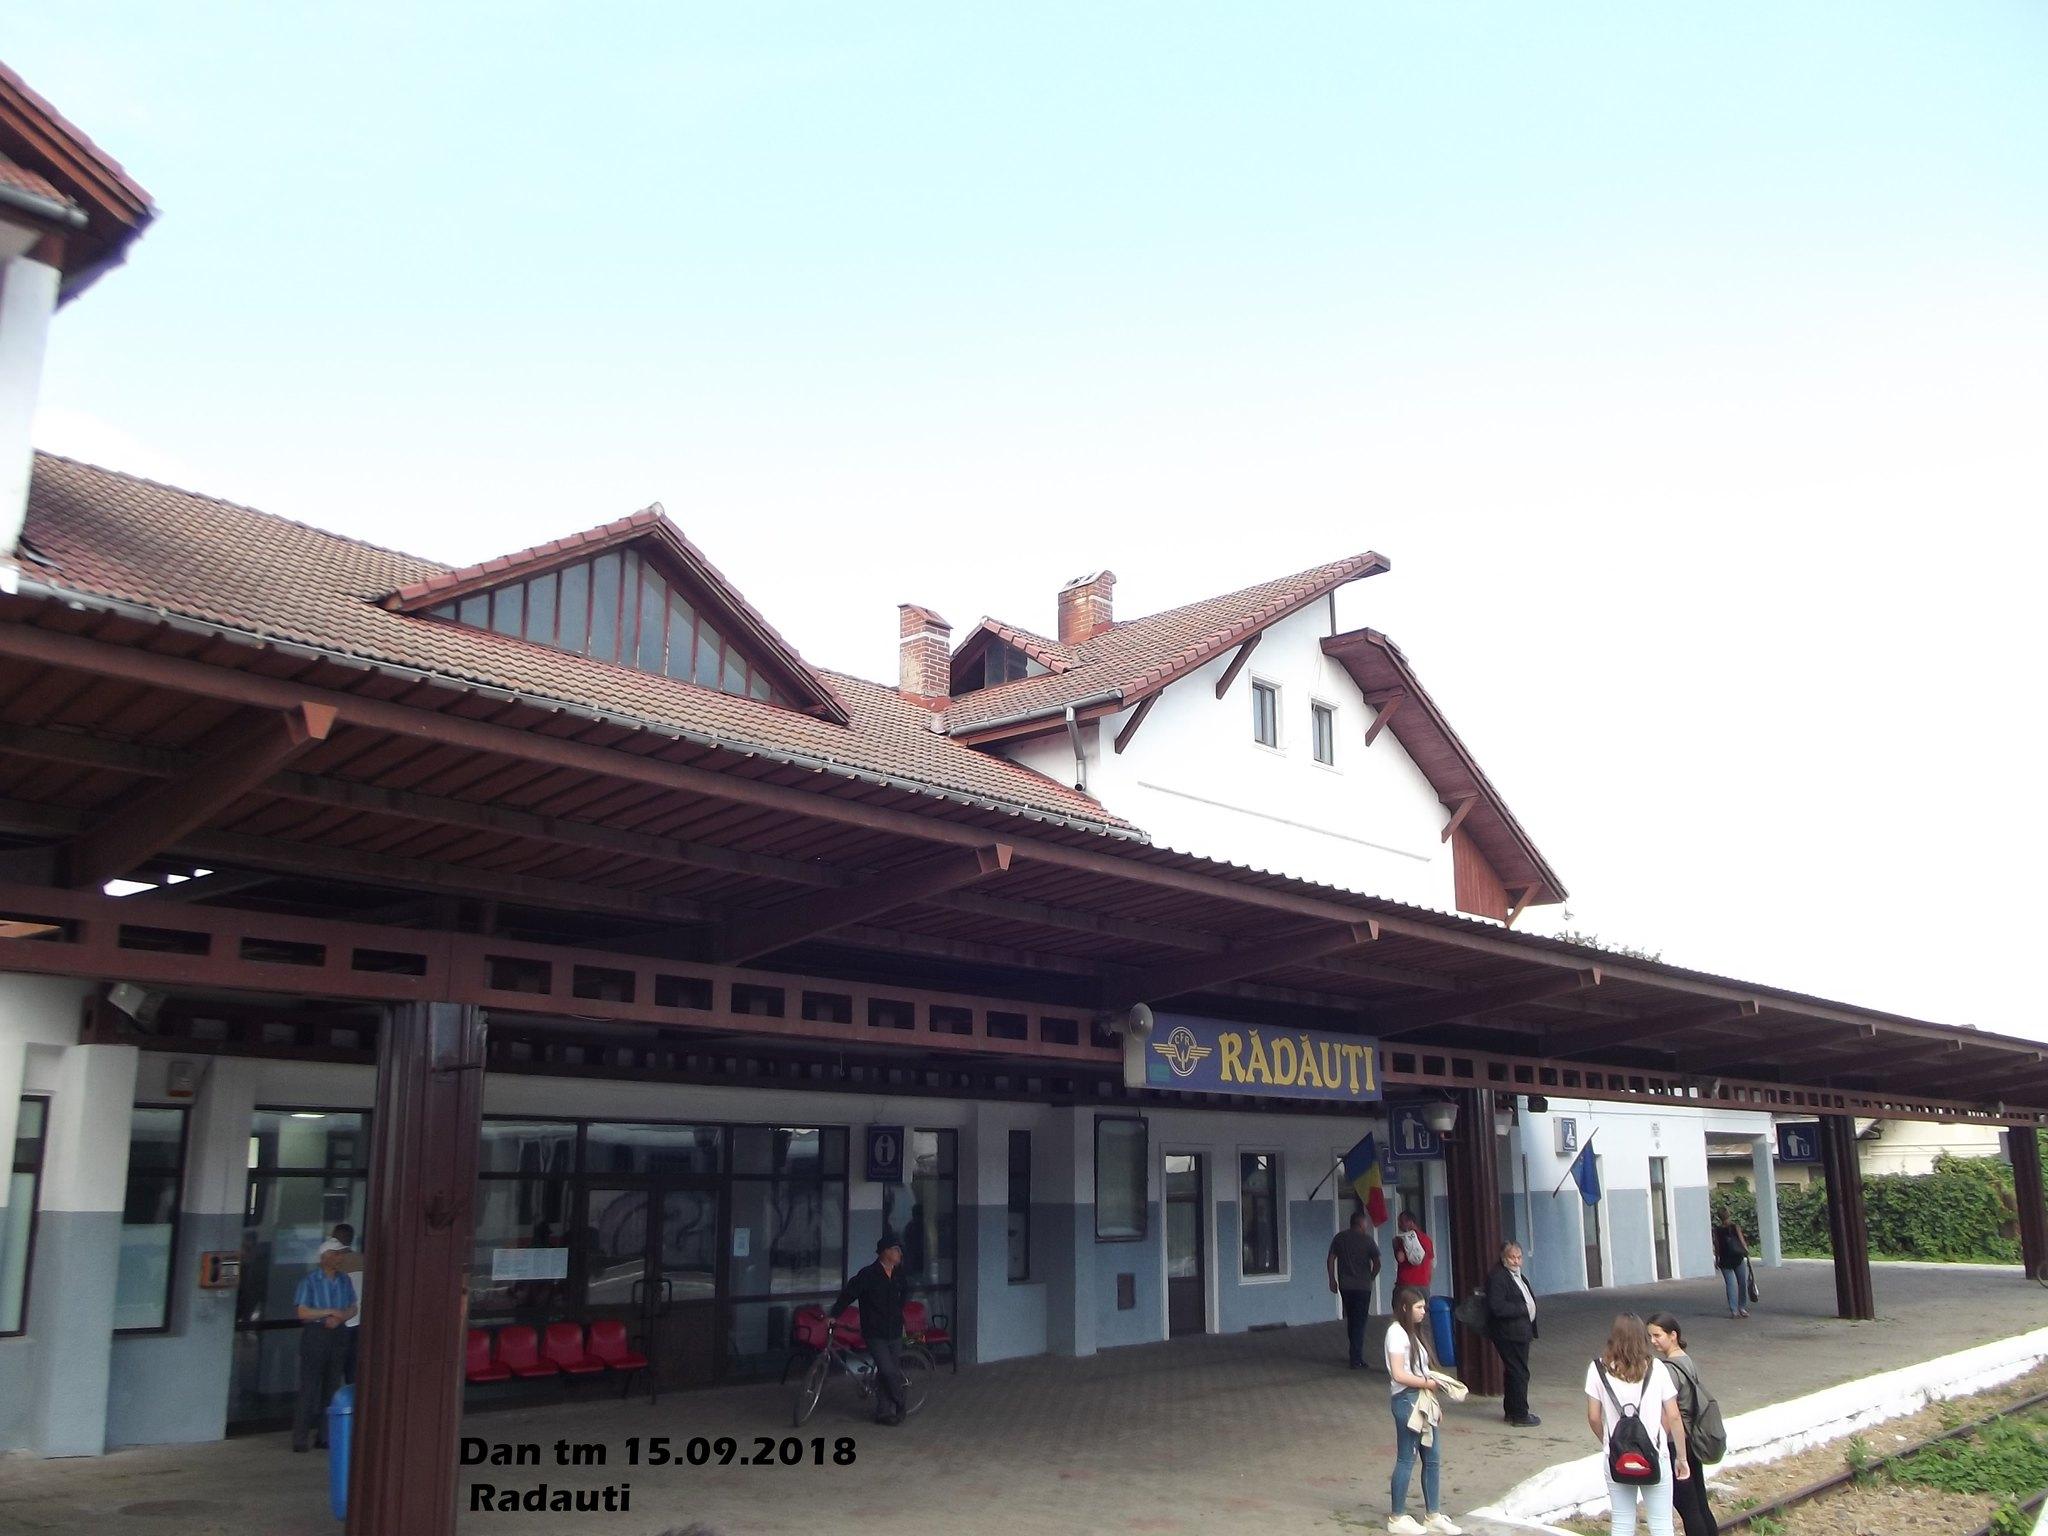 515 : Dorneşti - Gura Putnei - (Putna) - Nisipitu - Seletin UKR - Pagina 47 43826160425_43651fbefa_k